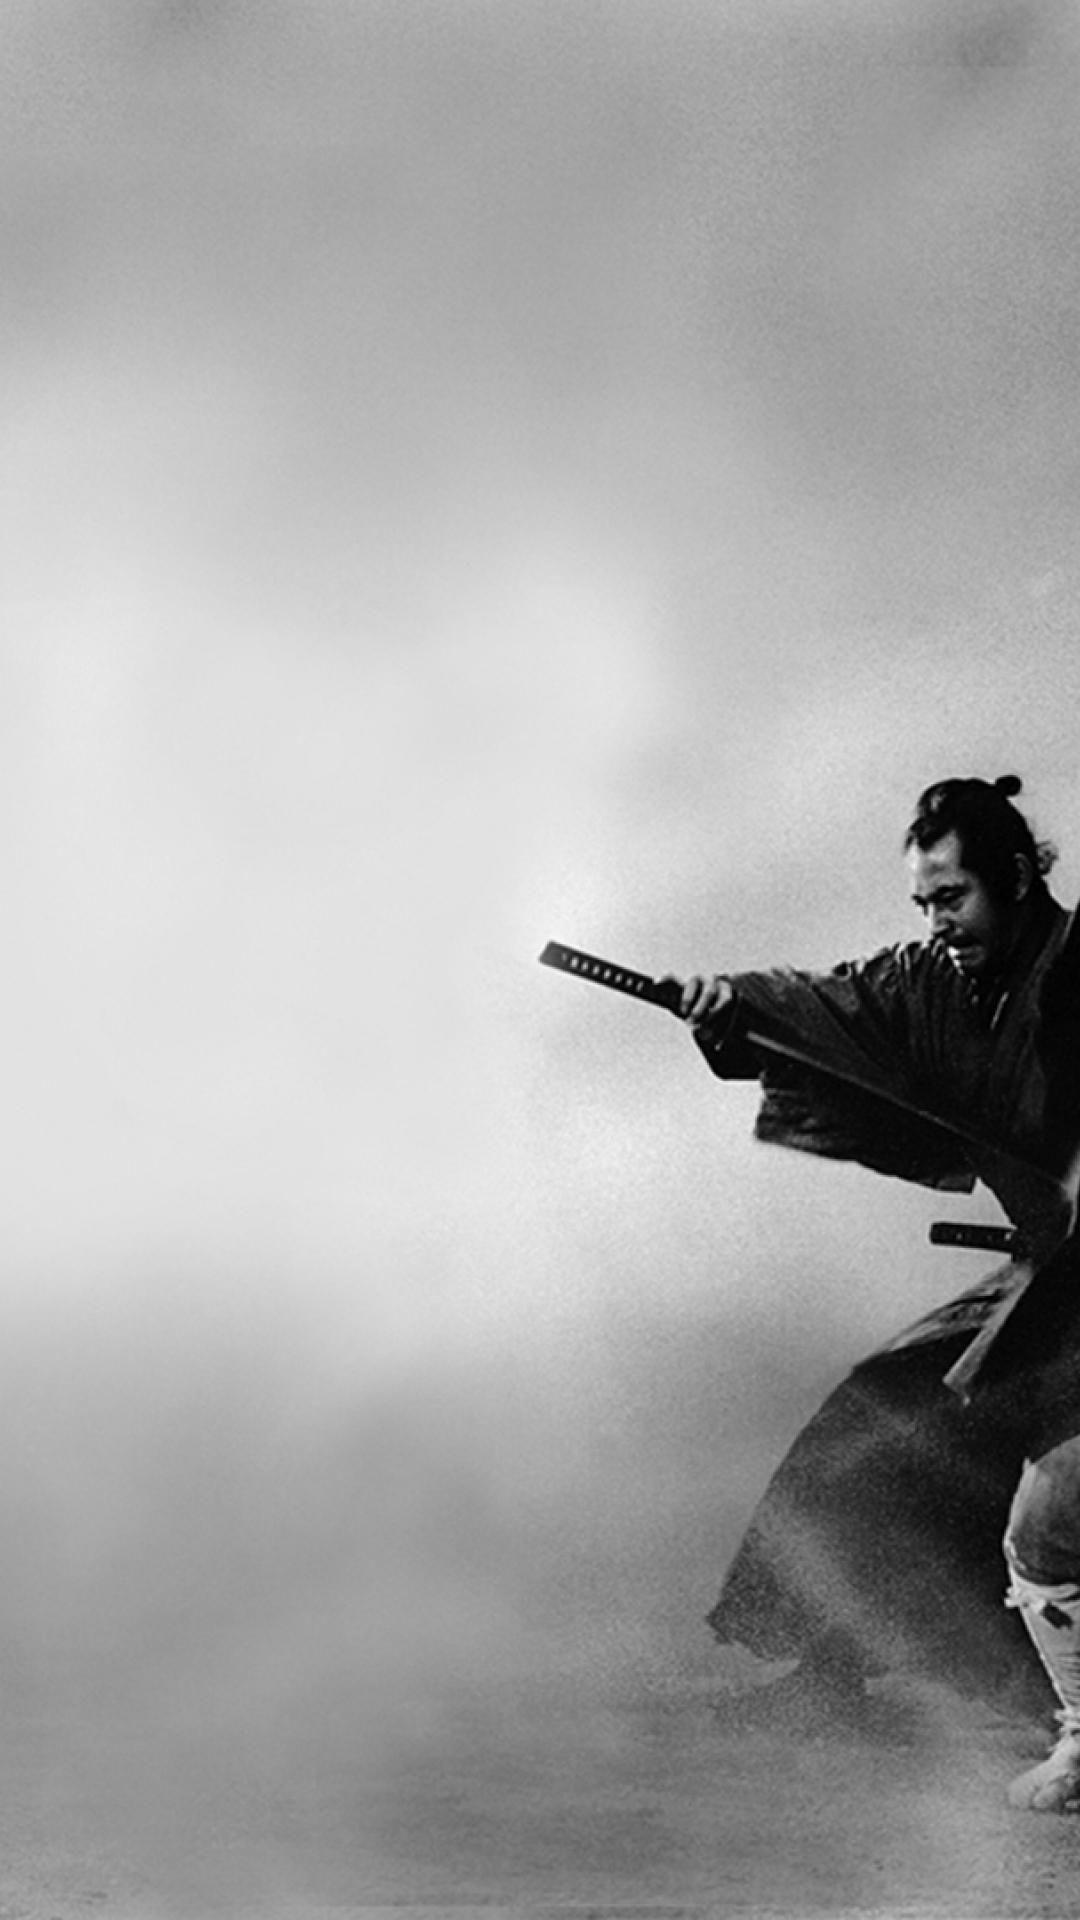 Japanese Samurai iPhone Wallpapers - Top Free Japanese ...